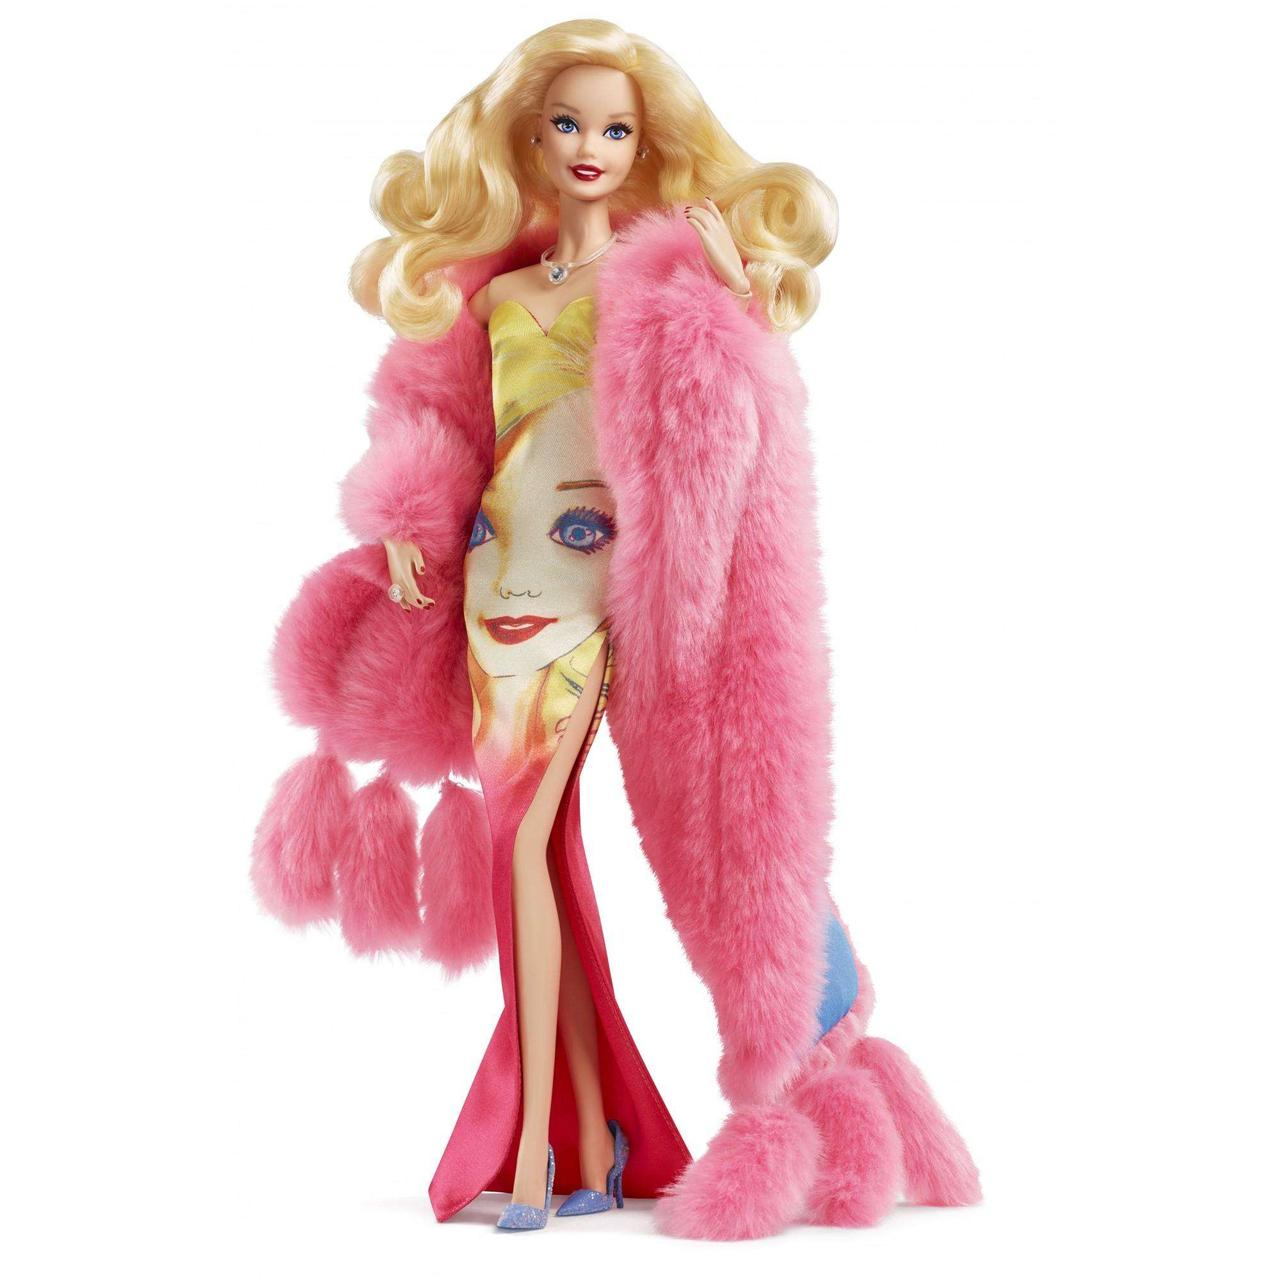 Лялька Барбі Енді Уорхол Andy Warhol Barbie Collector вархол суперстар енді вархол колекційна лялька оригіна